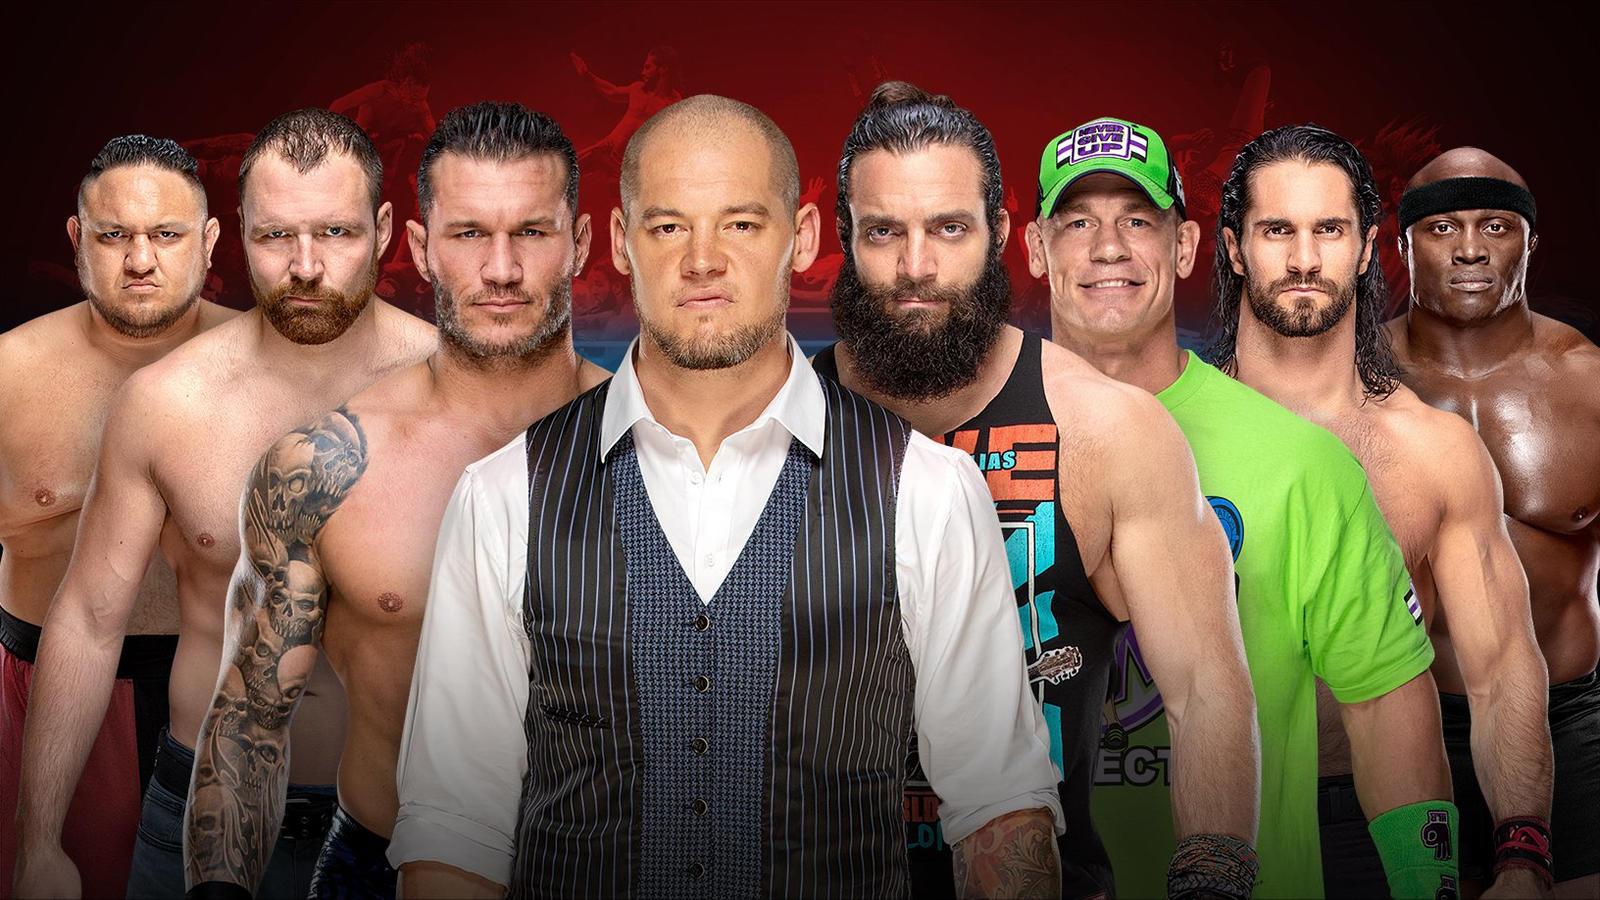 2019 Men's Royal Rumble Match